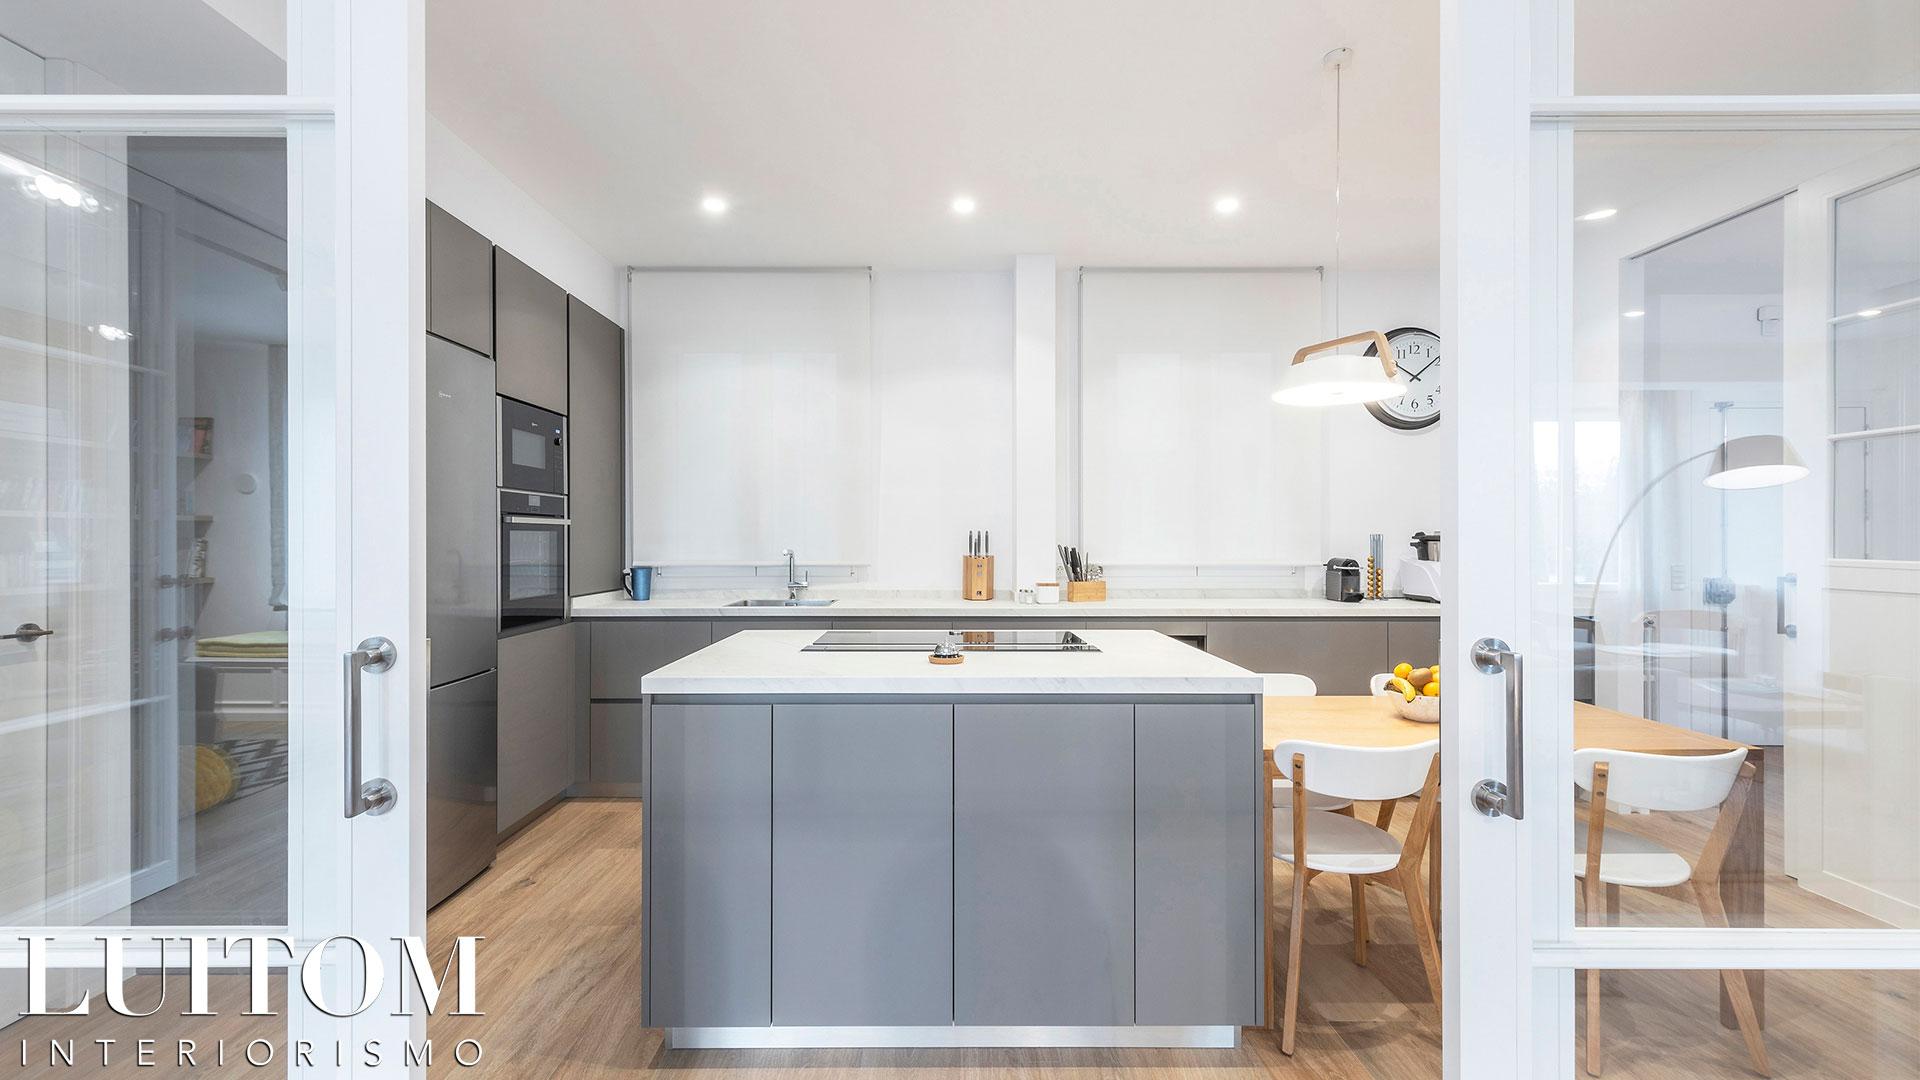 ideas-reformas-casas-lujo-interiorismo-decoracion-viviendas-luxury-home-living-kitchen-interior-design-01